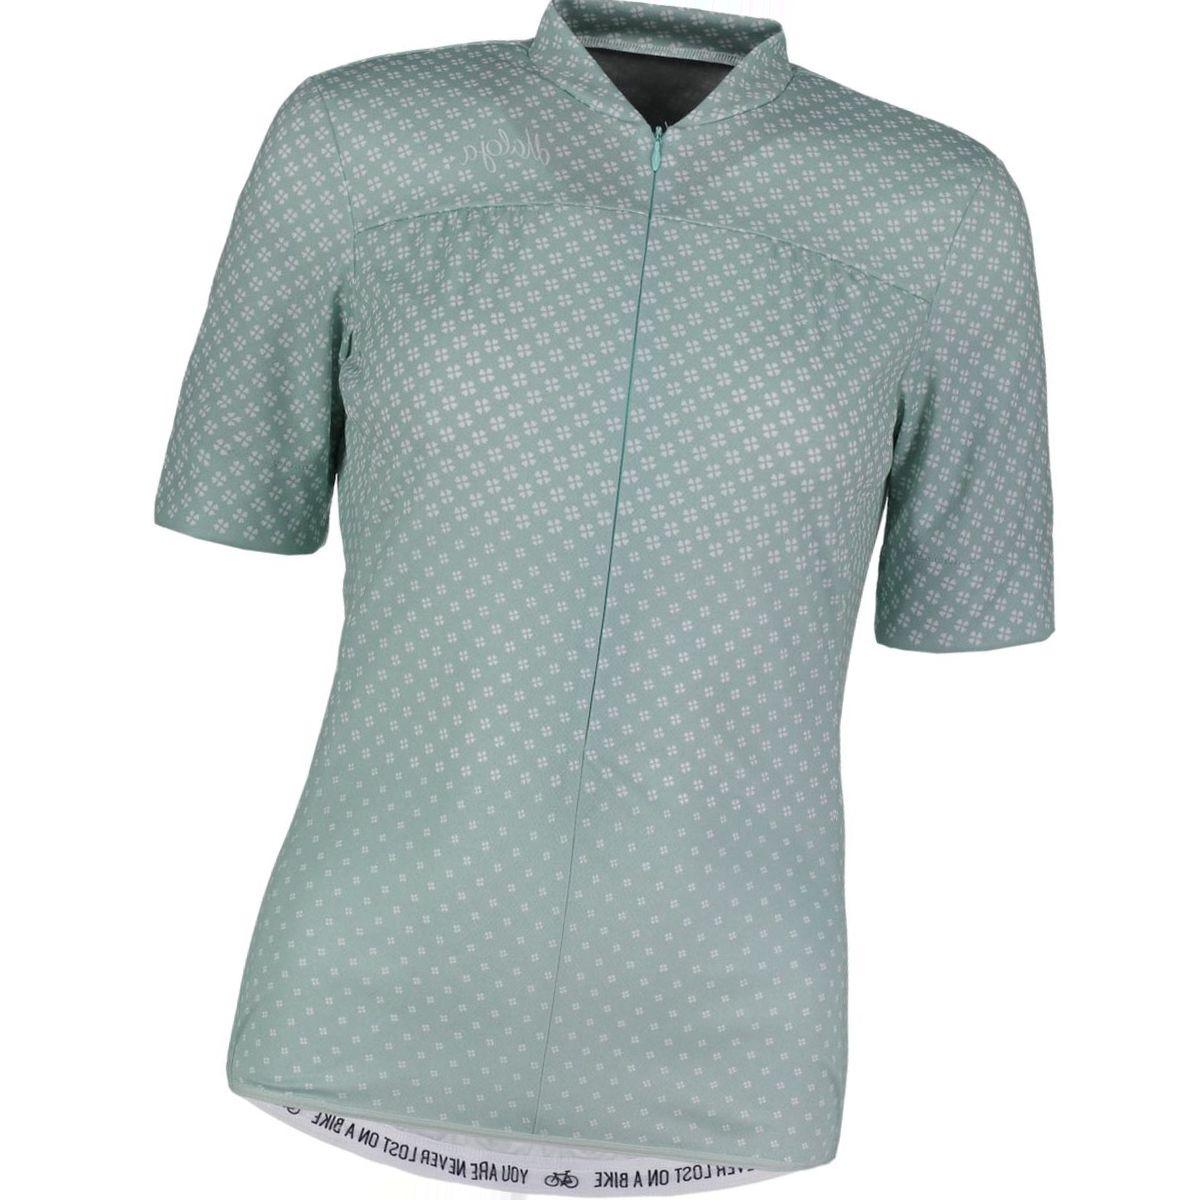 Maloja CostettaM. 1/2 Short-Sleeve Jersey - Women's